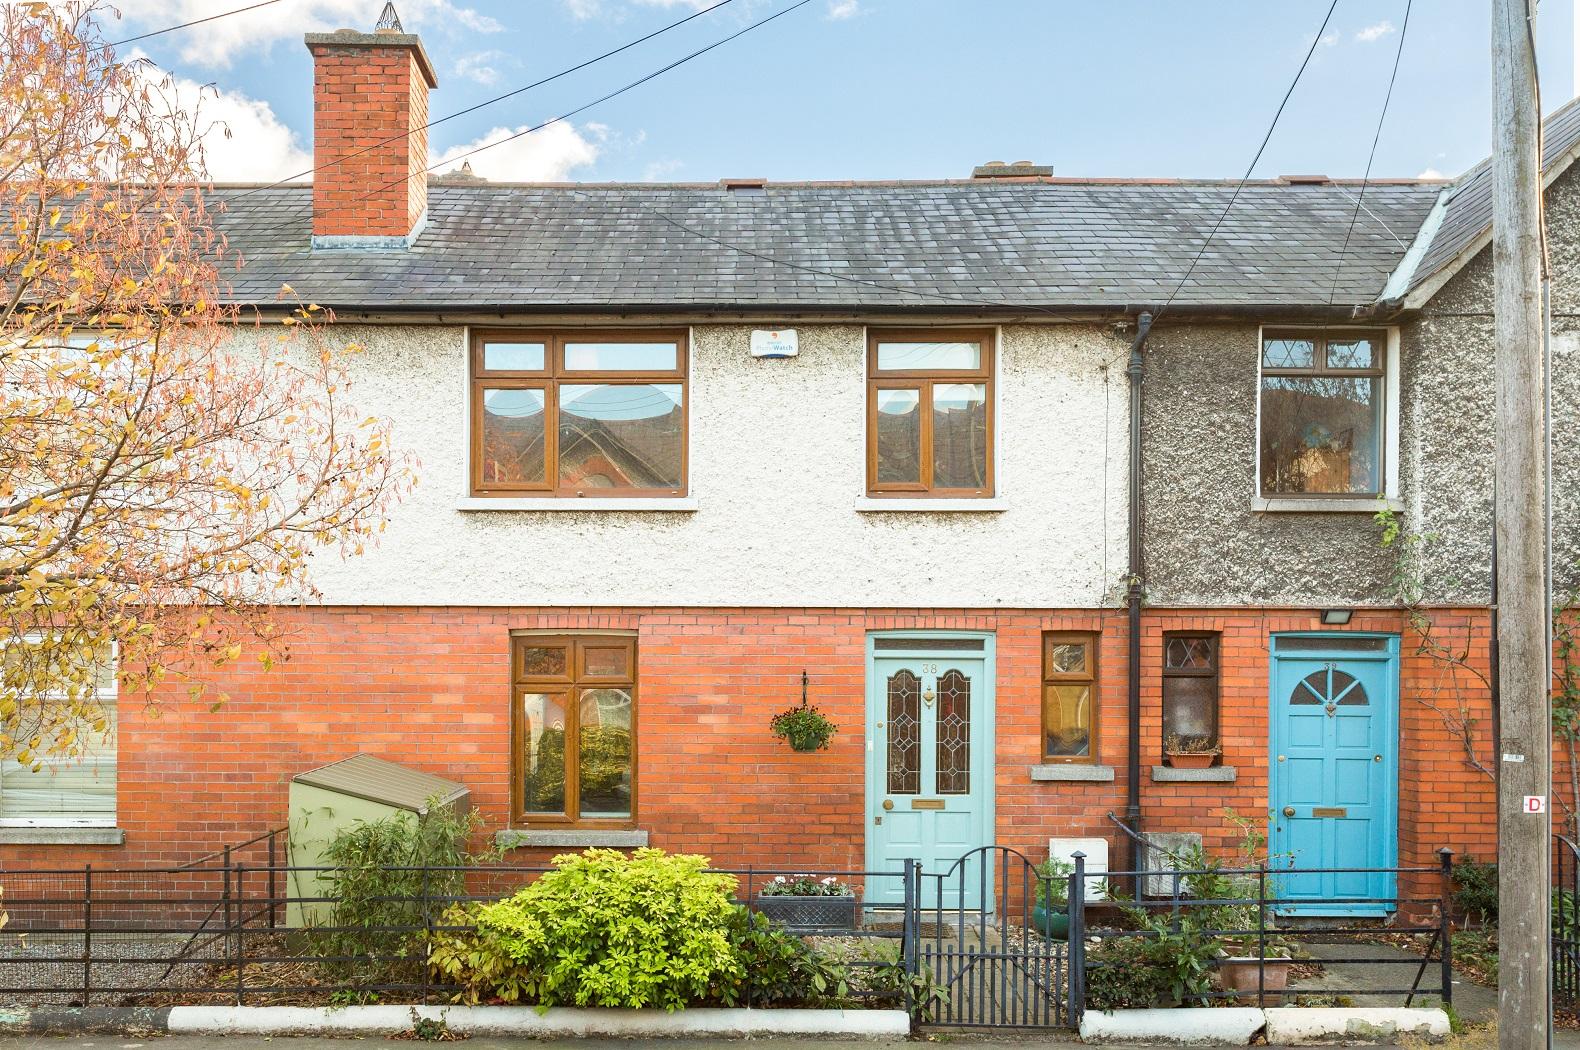 38 O'Donovan Road, South Circular Road, Dublin 8